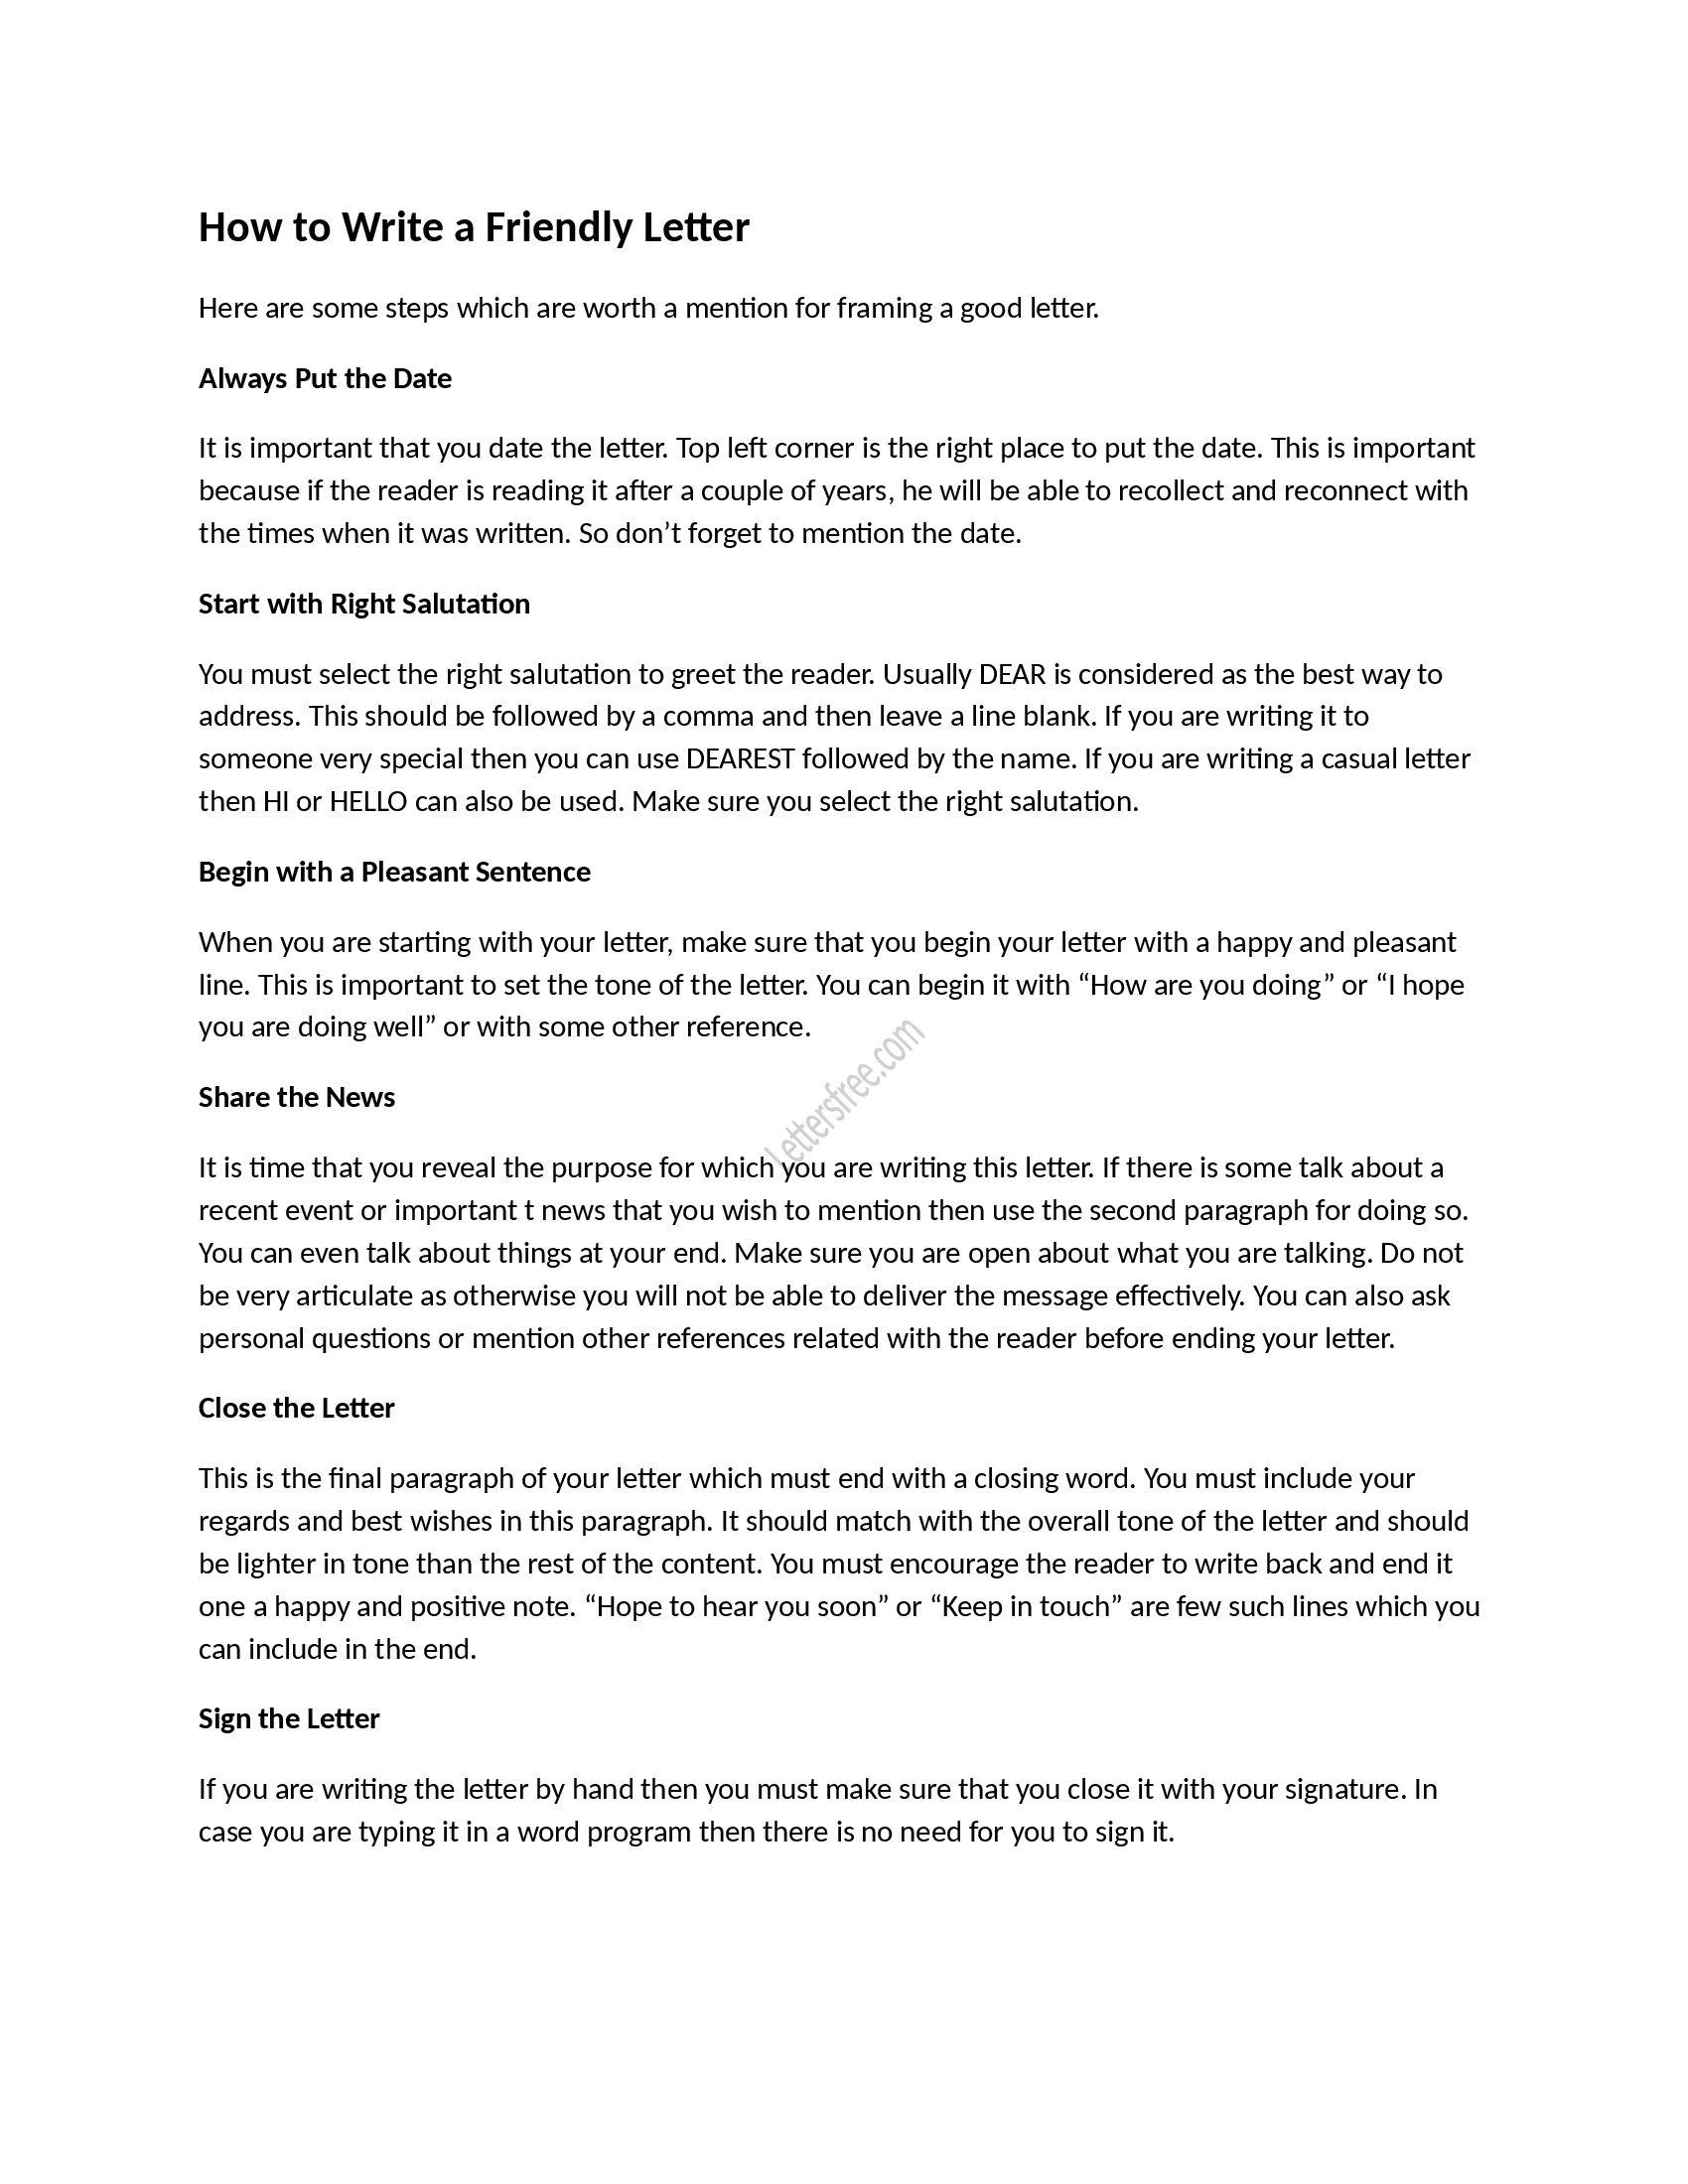 Developed Fourth Grade Reading Worksheets